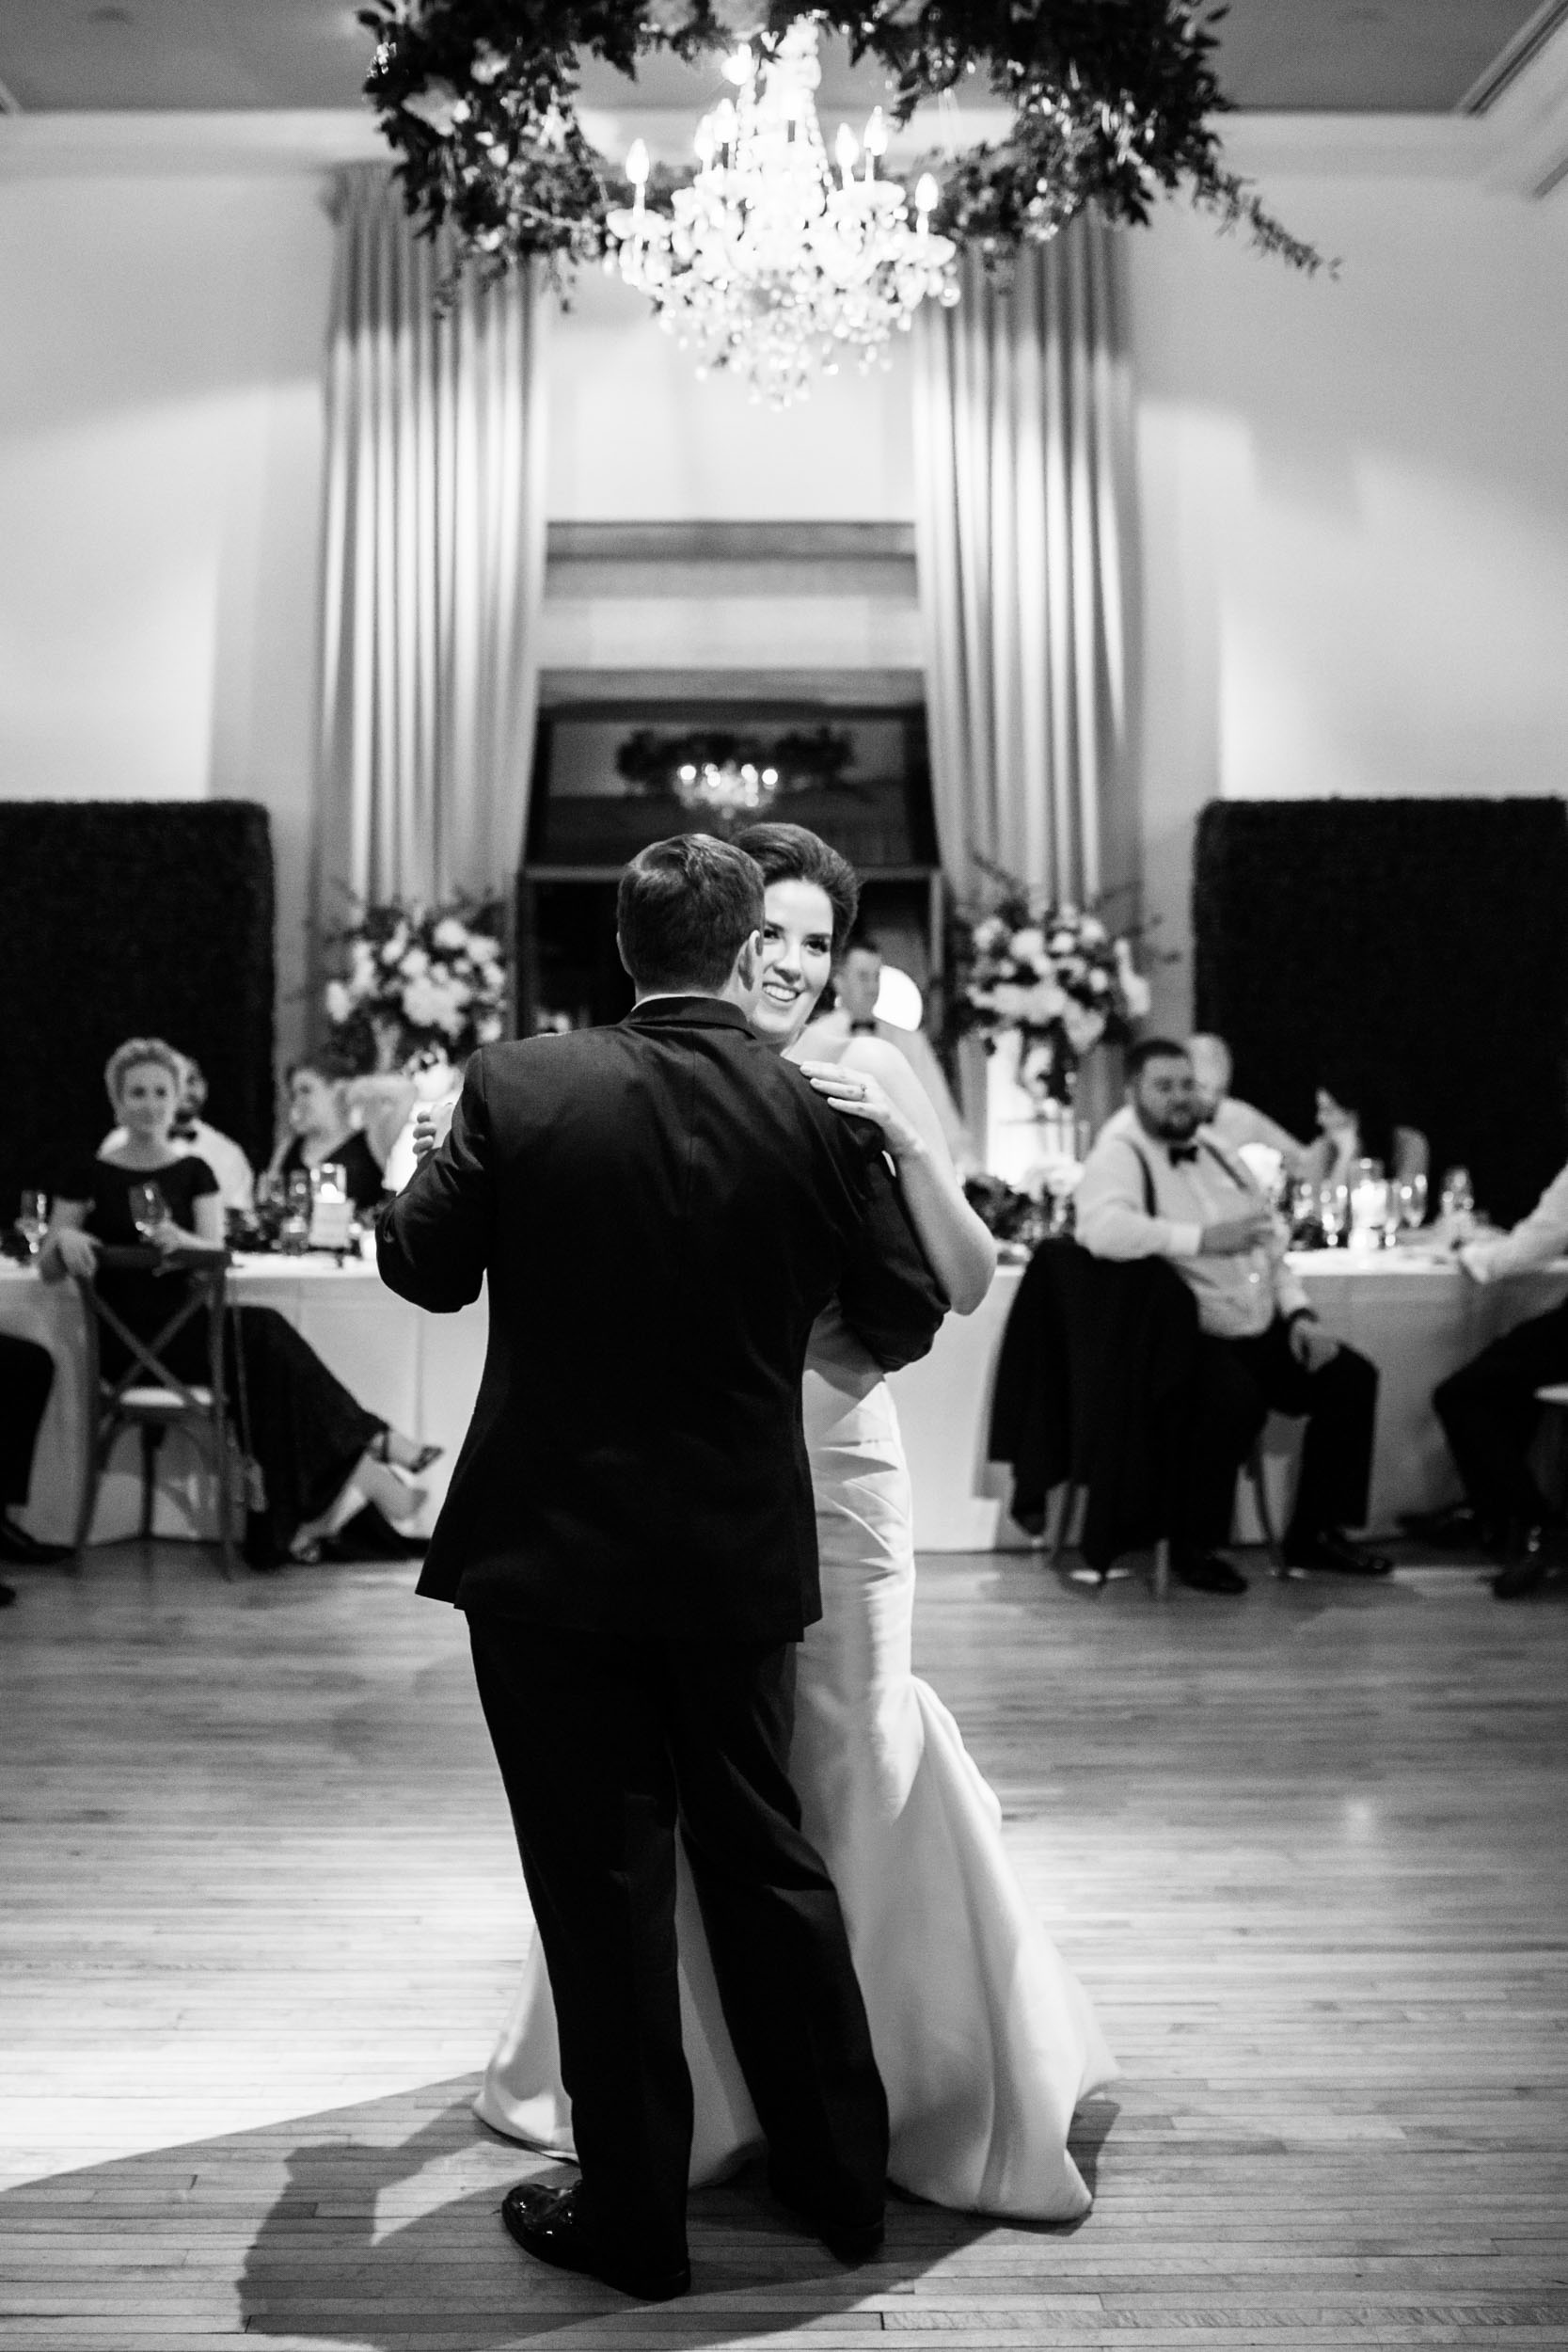 First dance songs for elegant Chicago weddings